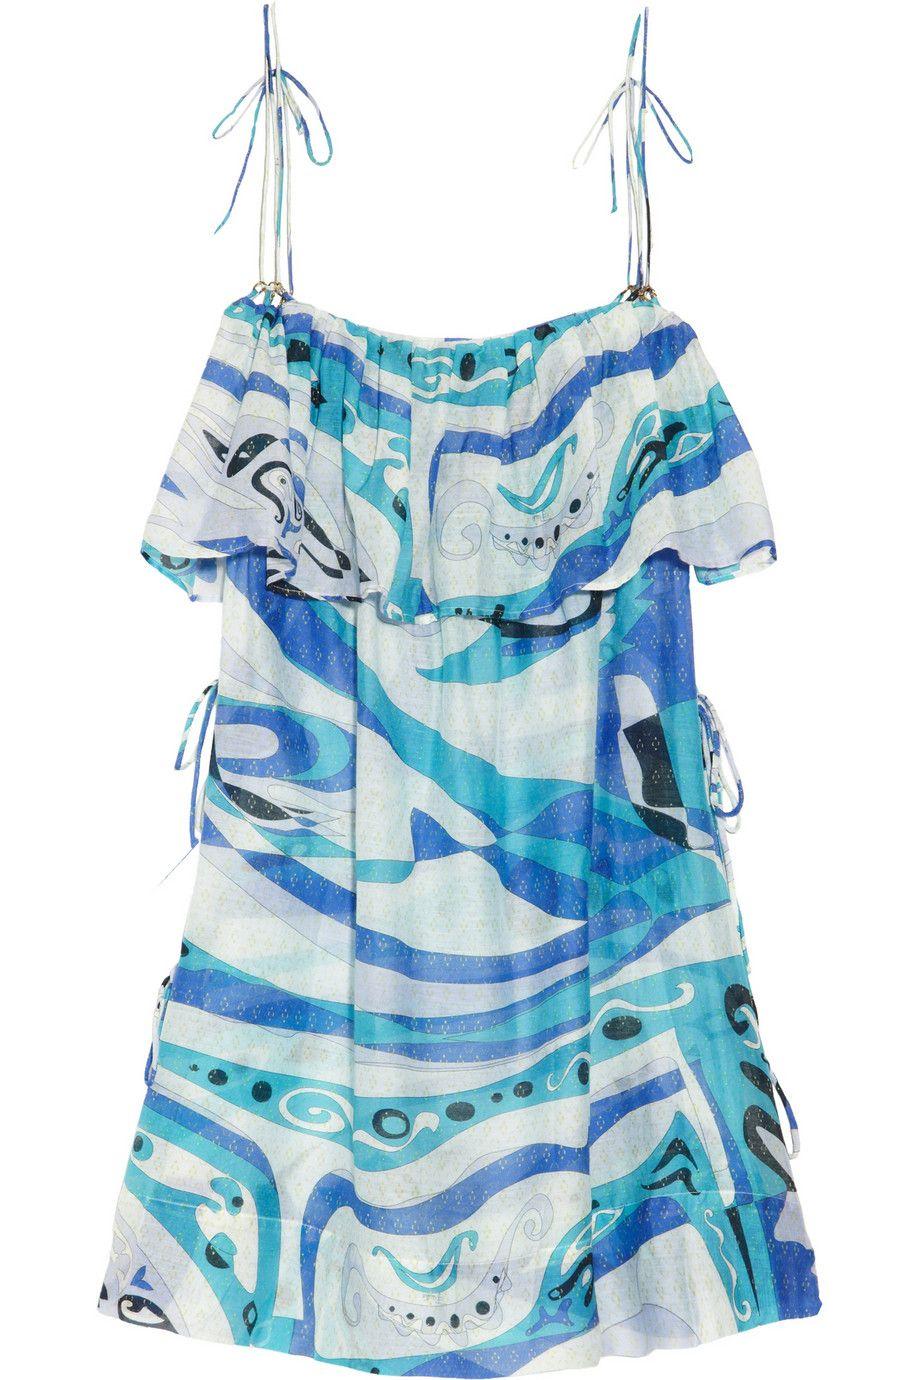 Emilio Pucci|Aracaju printed cotton and silk-blend beach dress |NET-A-PORTER.COM